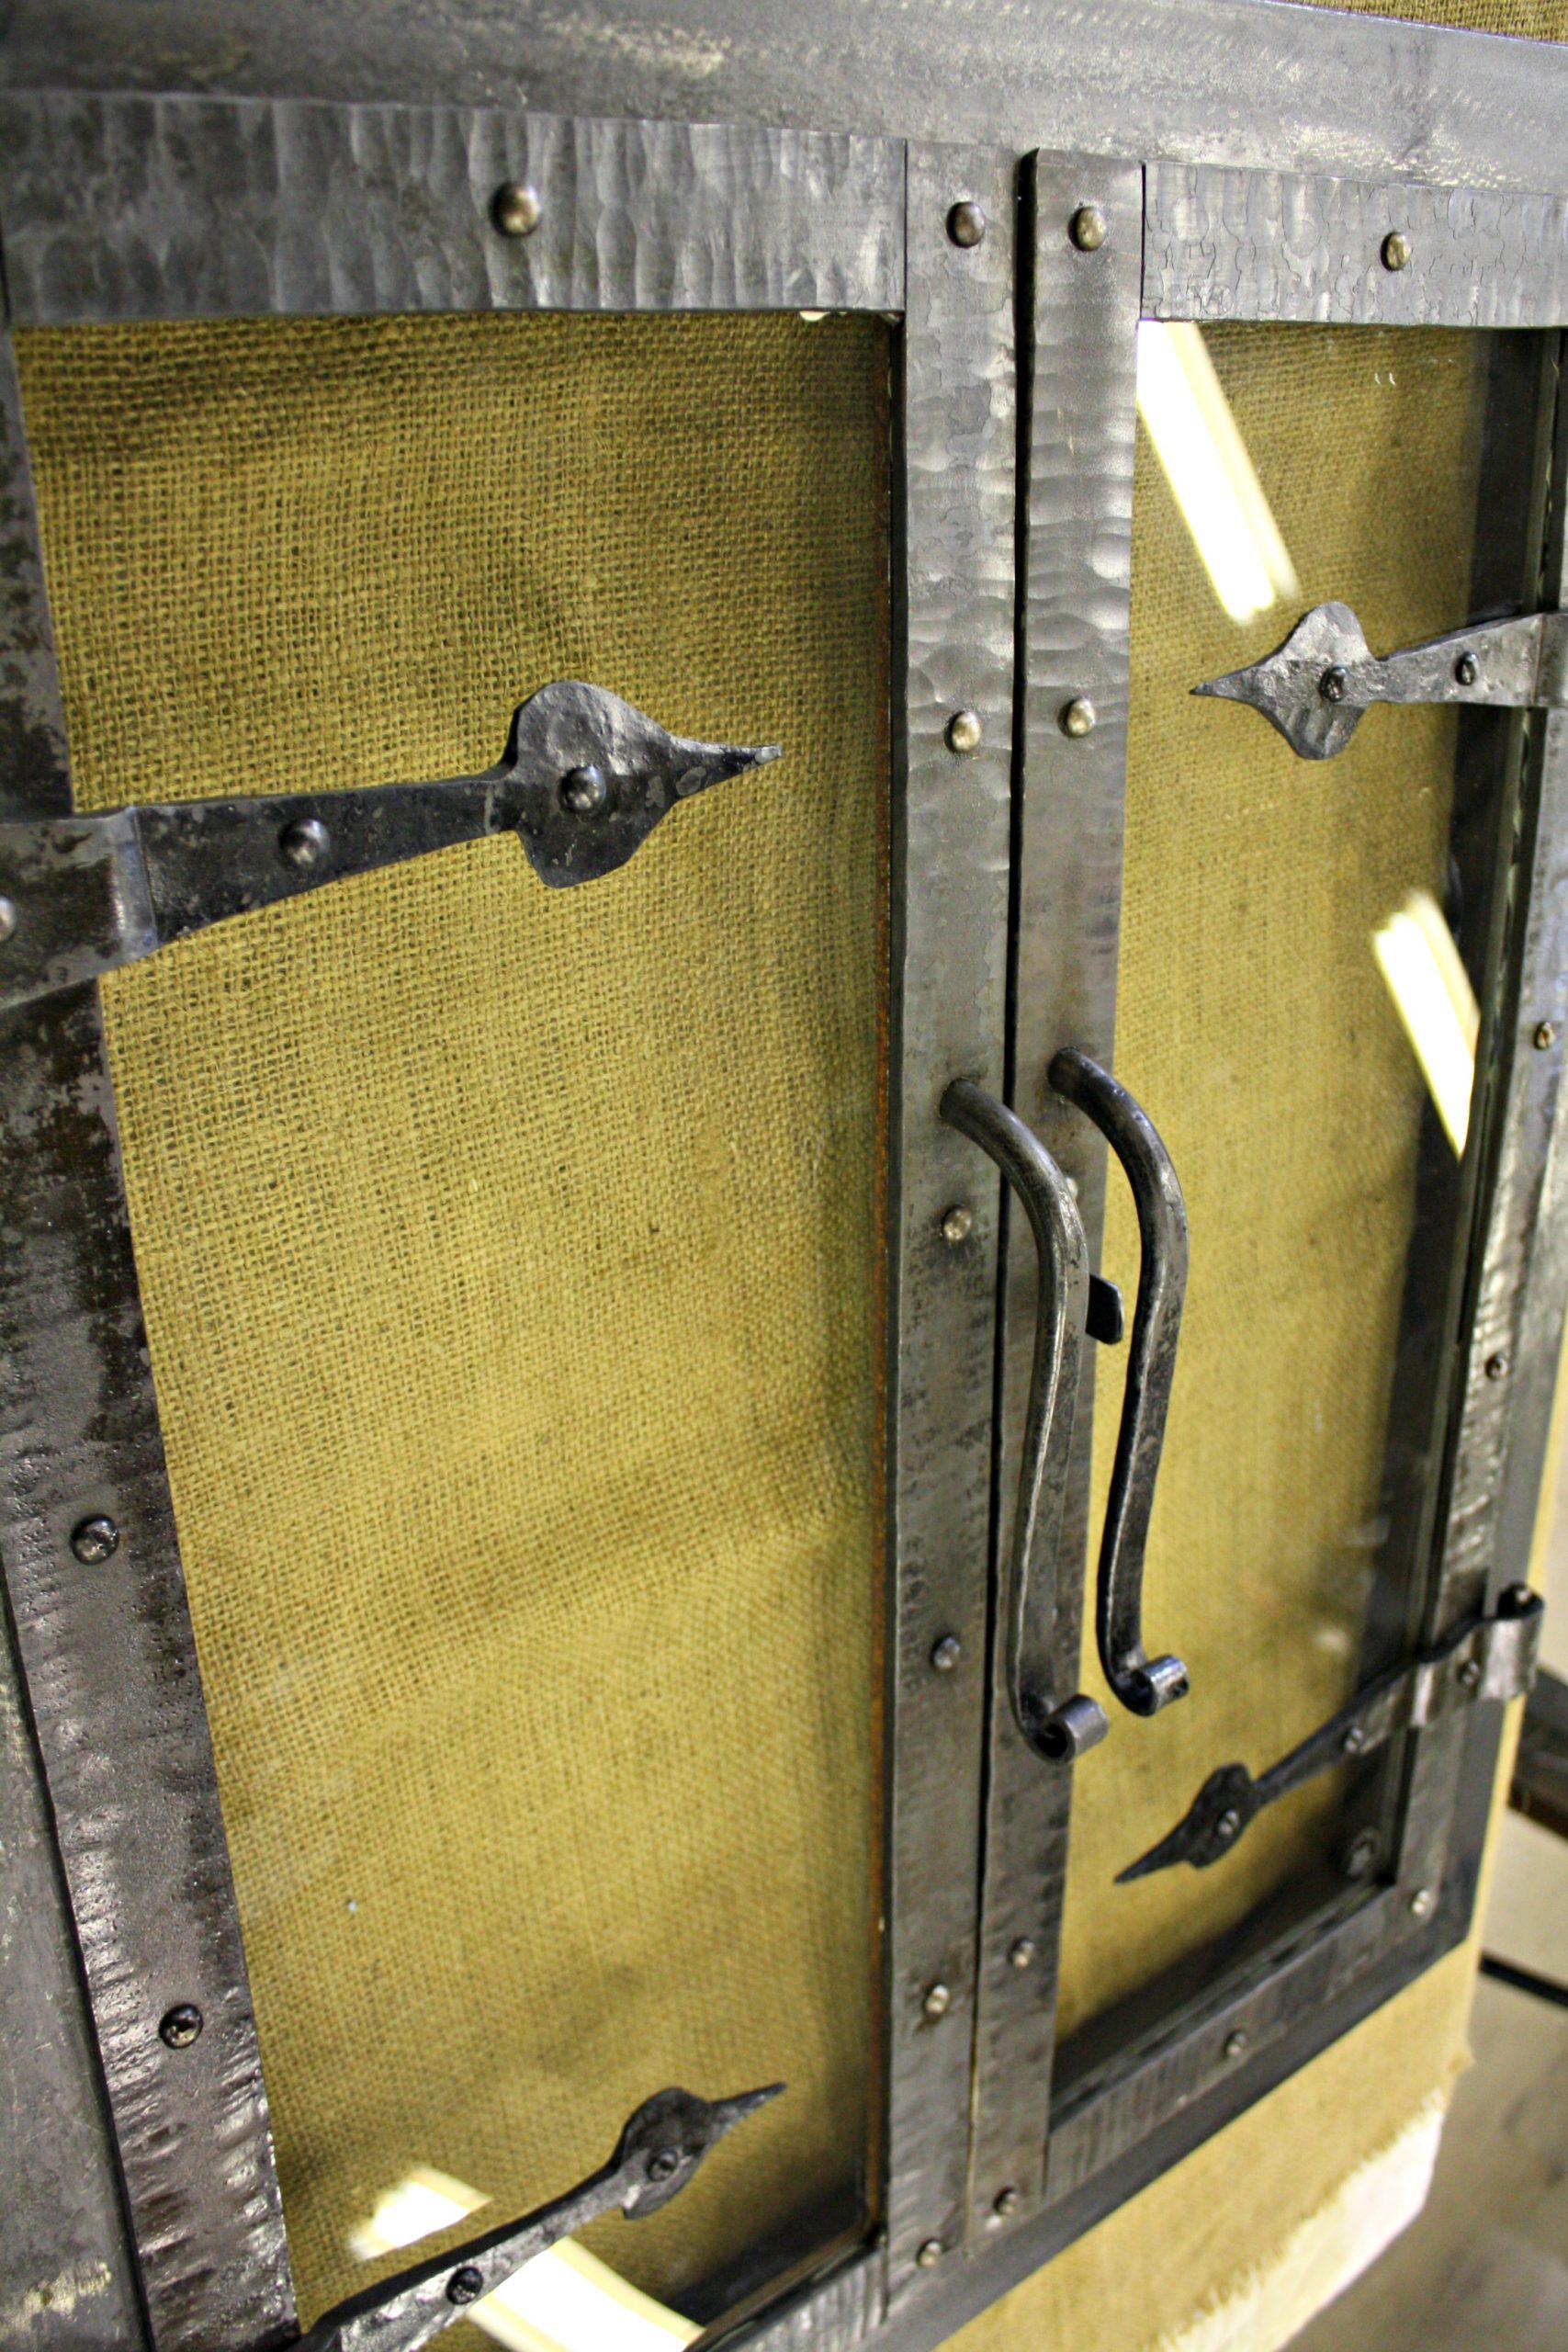 Fireplace Doors with hidden latch